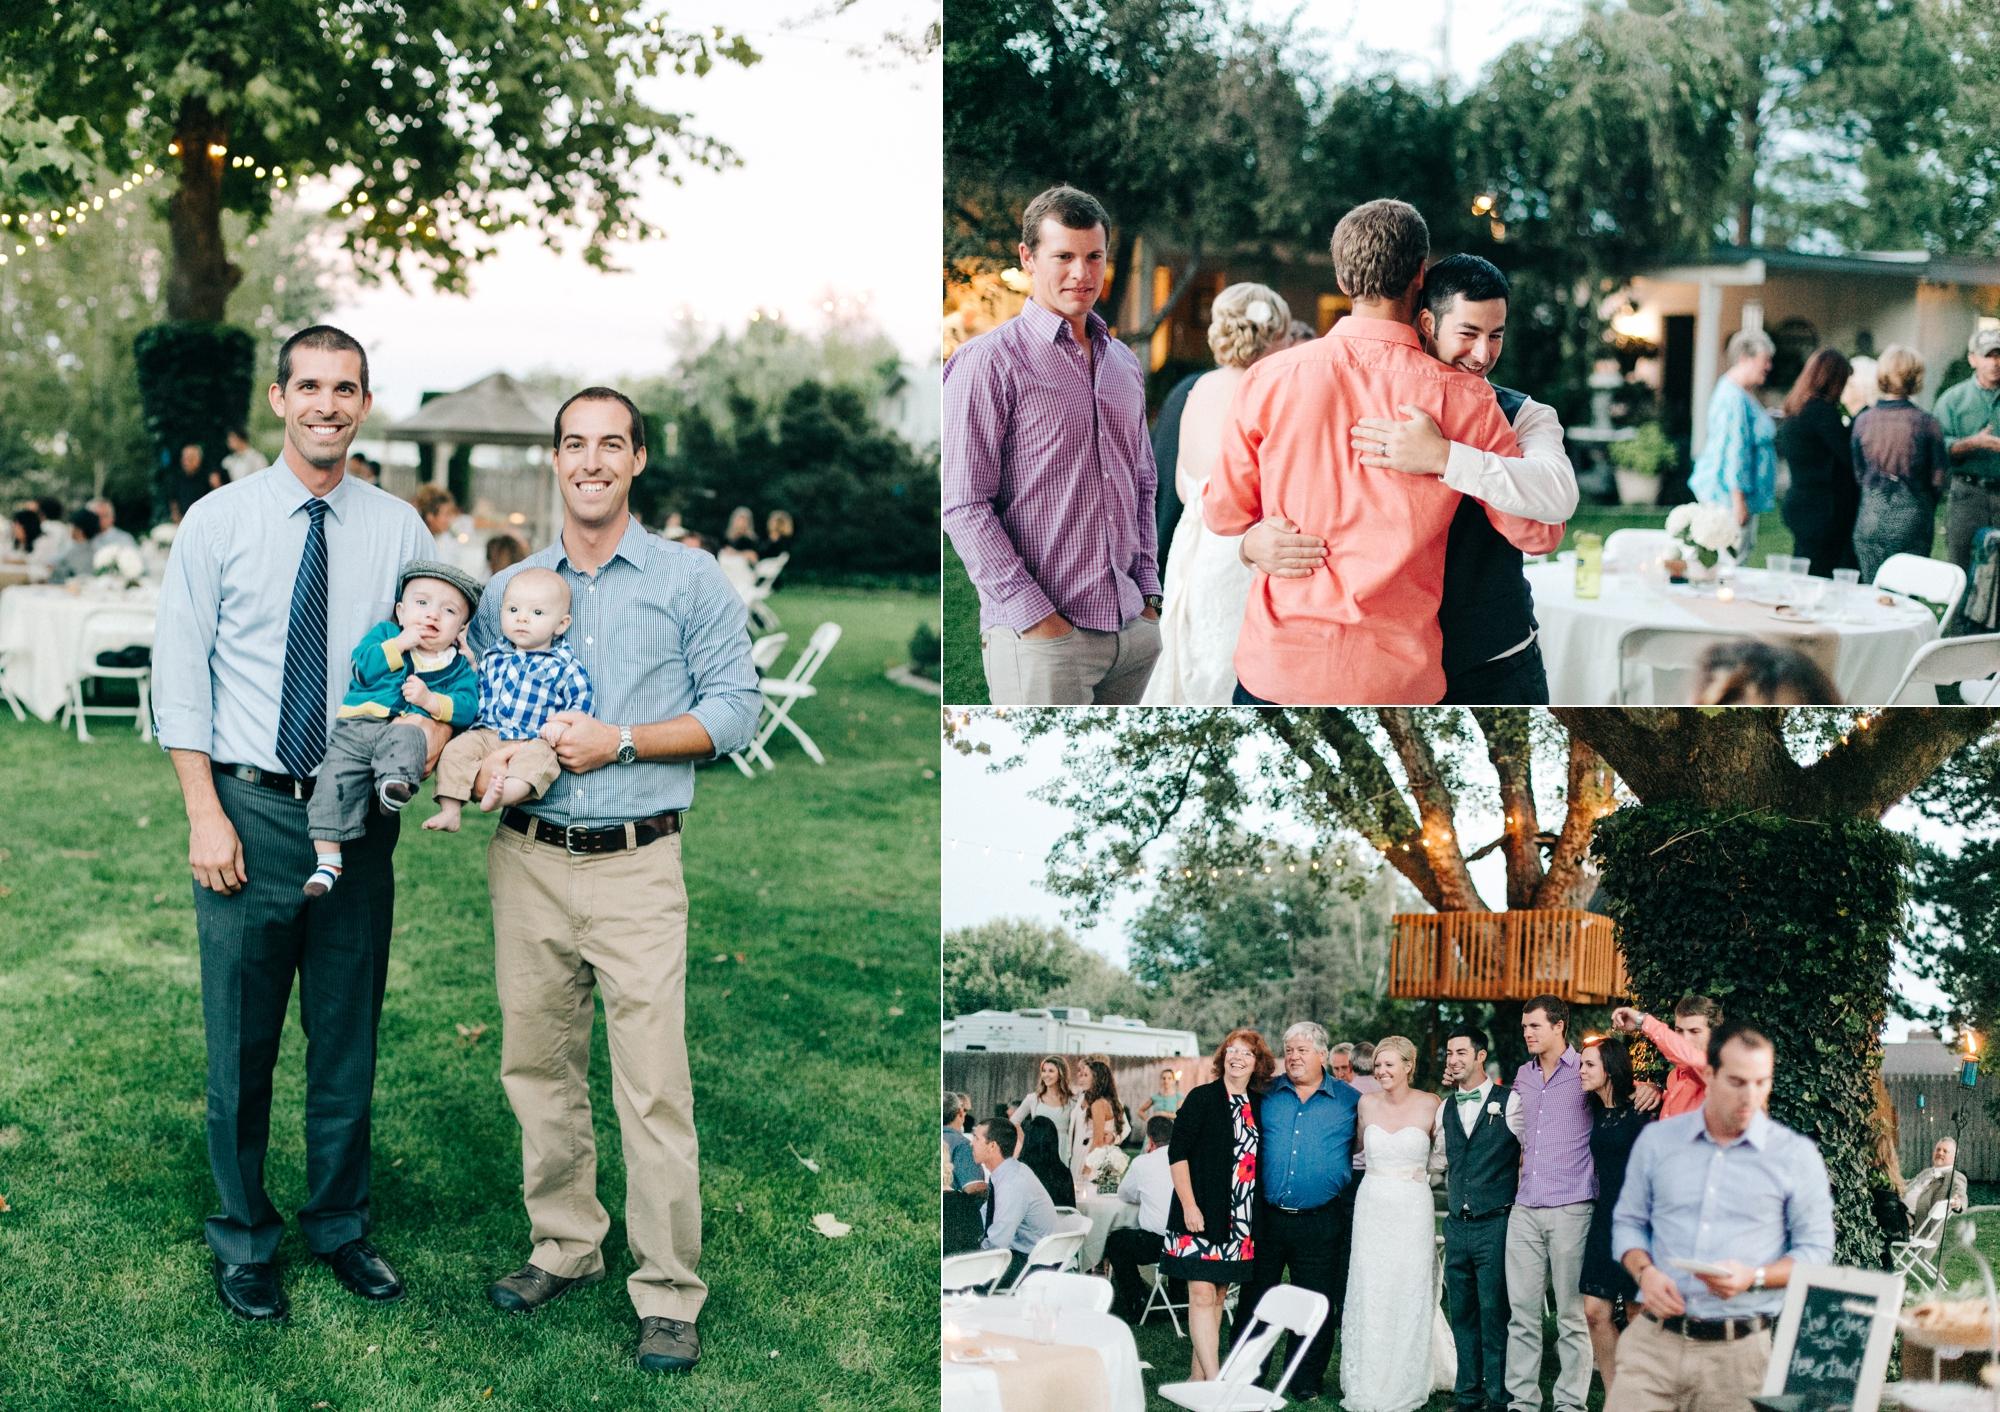 25_Backyard_Pasco_Washington_Wedding_Photo.JPG